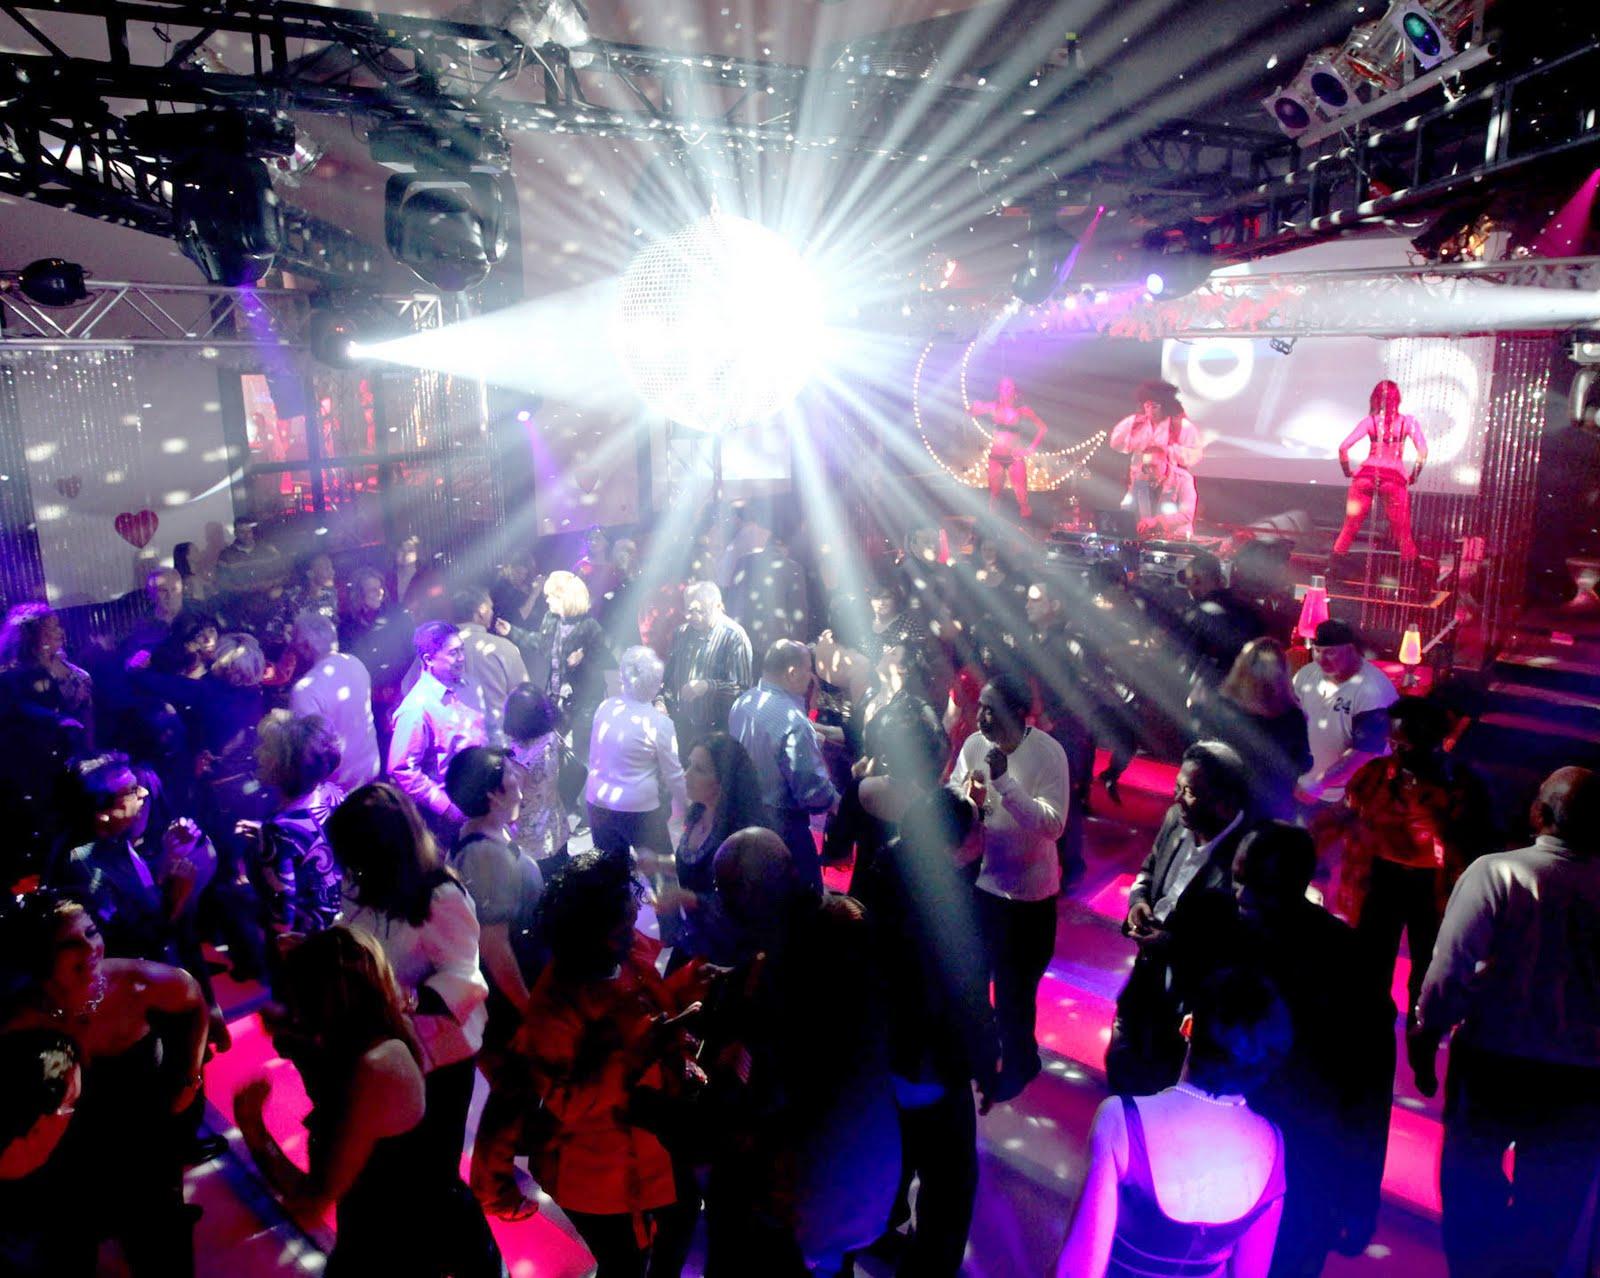 News and entertainment night club jan 04 2013 21 47 18 for Disco night club